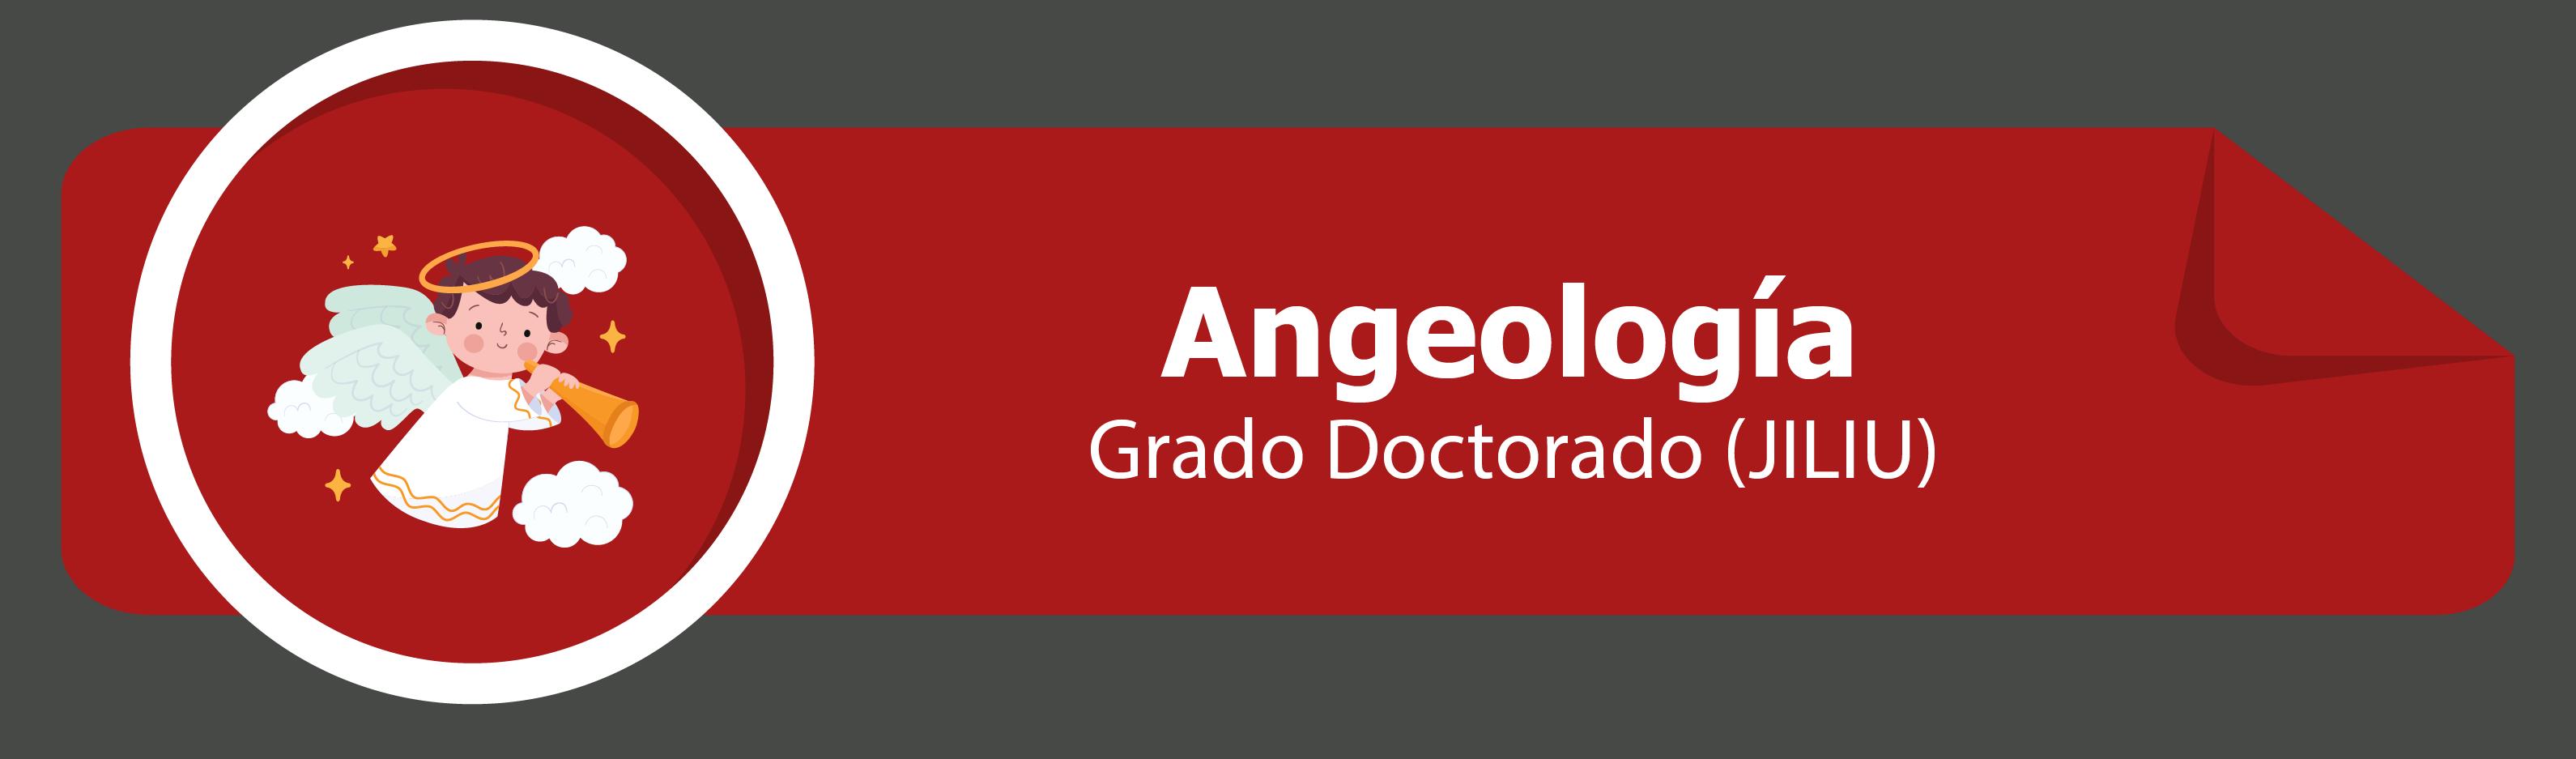 Angeología